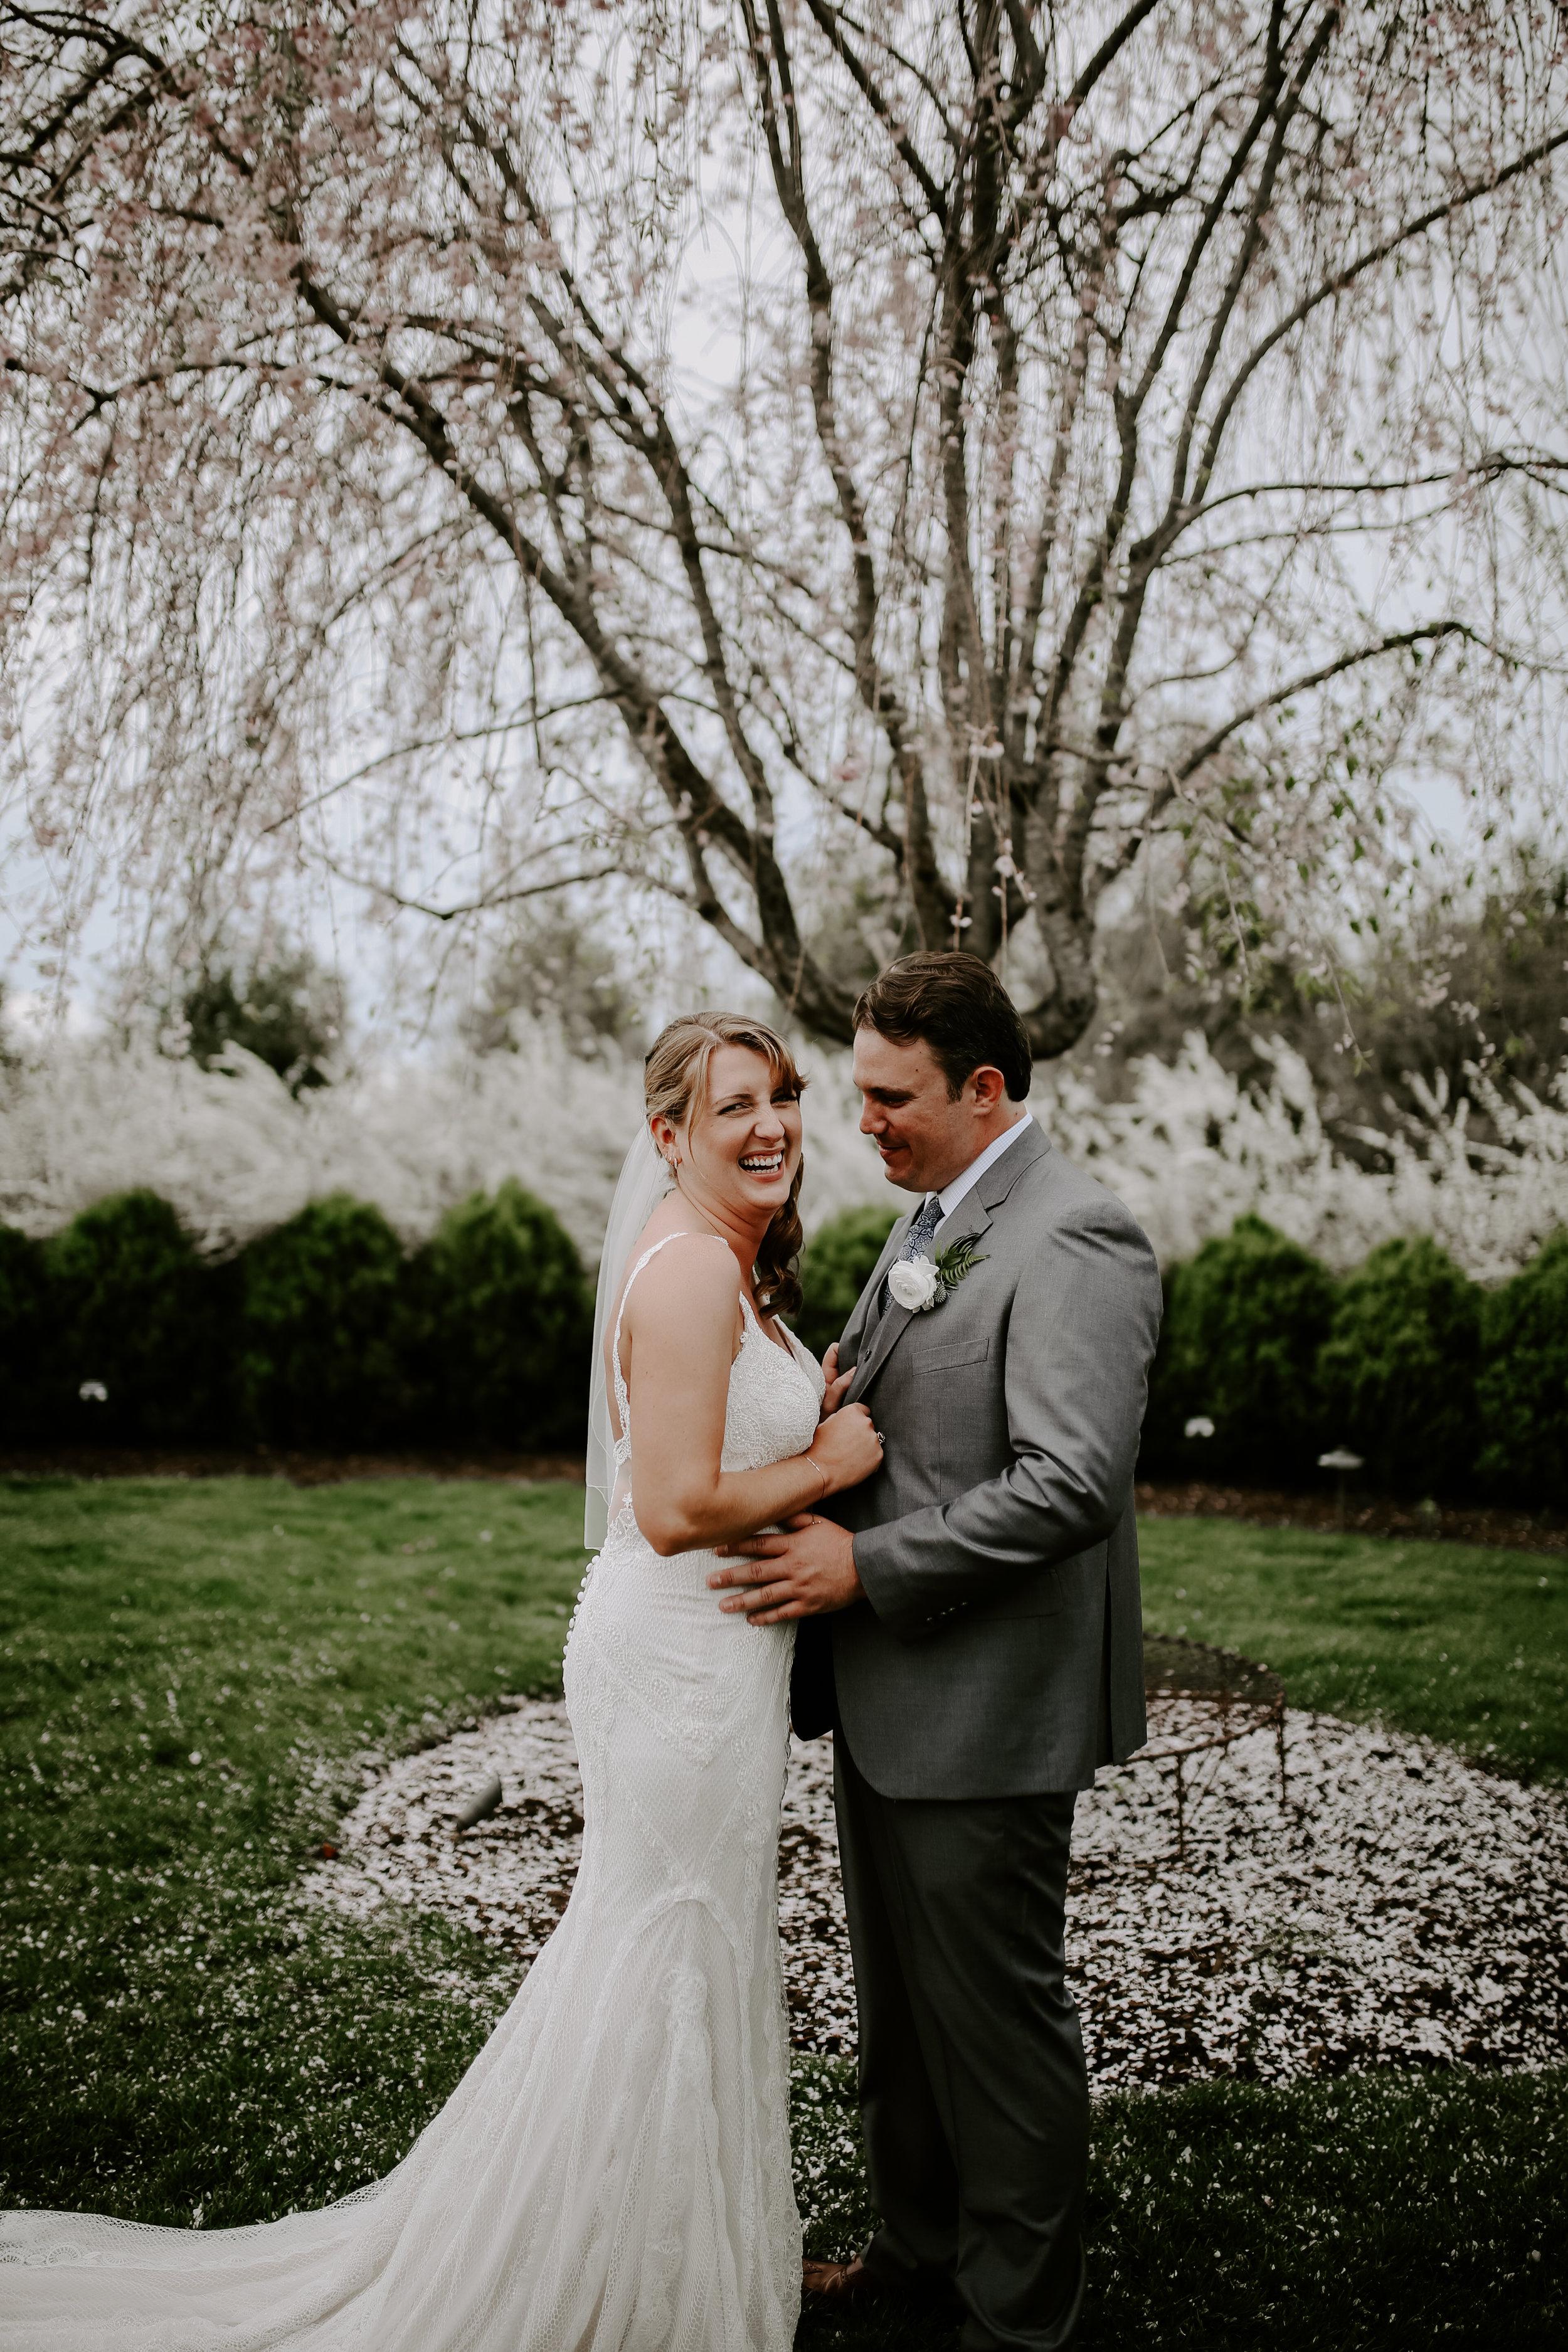 TheGreens_Married_2019-108.jpg